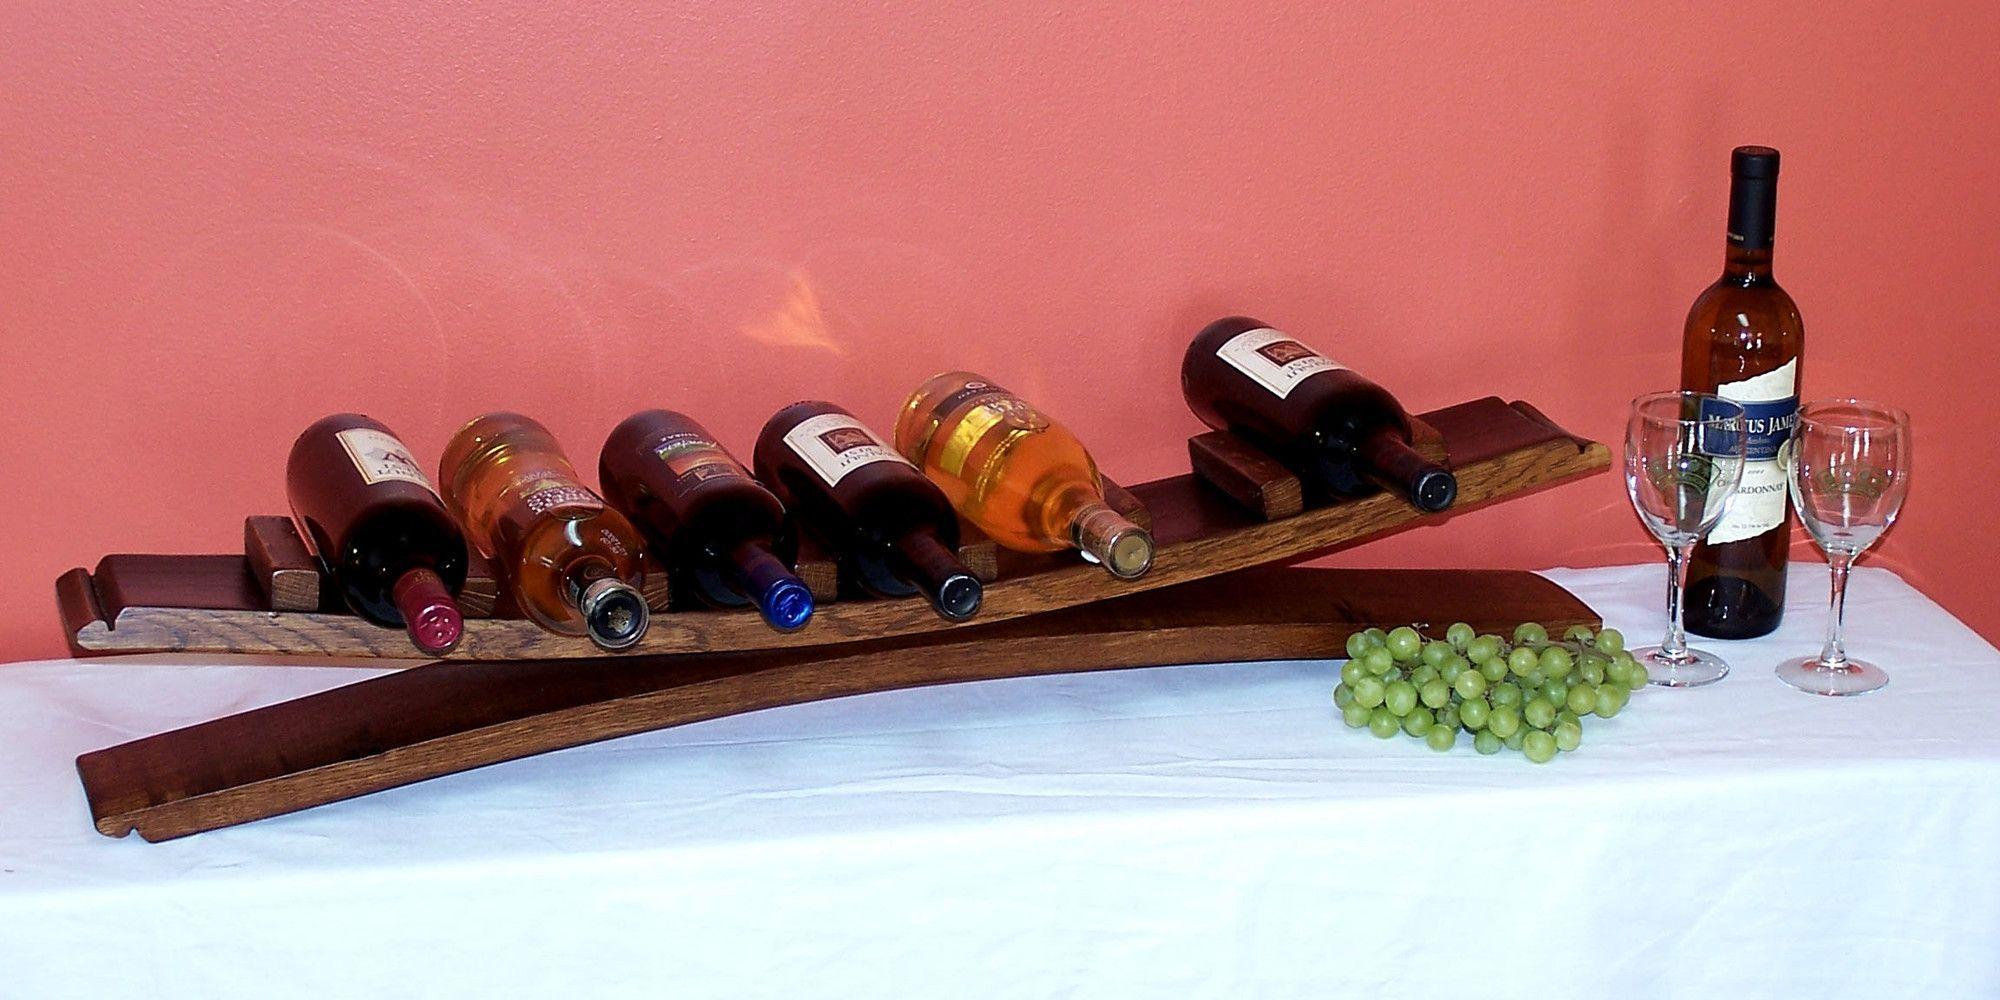 2 Day 7 Bottle Tabletop Wine Rack Wine Rack Table Top Wine Rack Wine Glass Rack